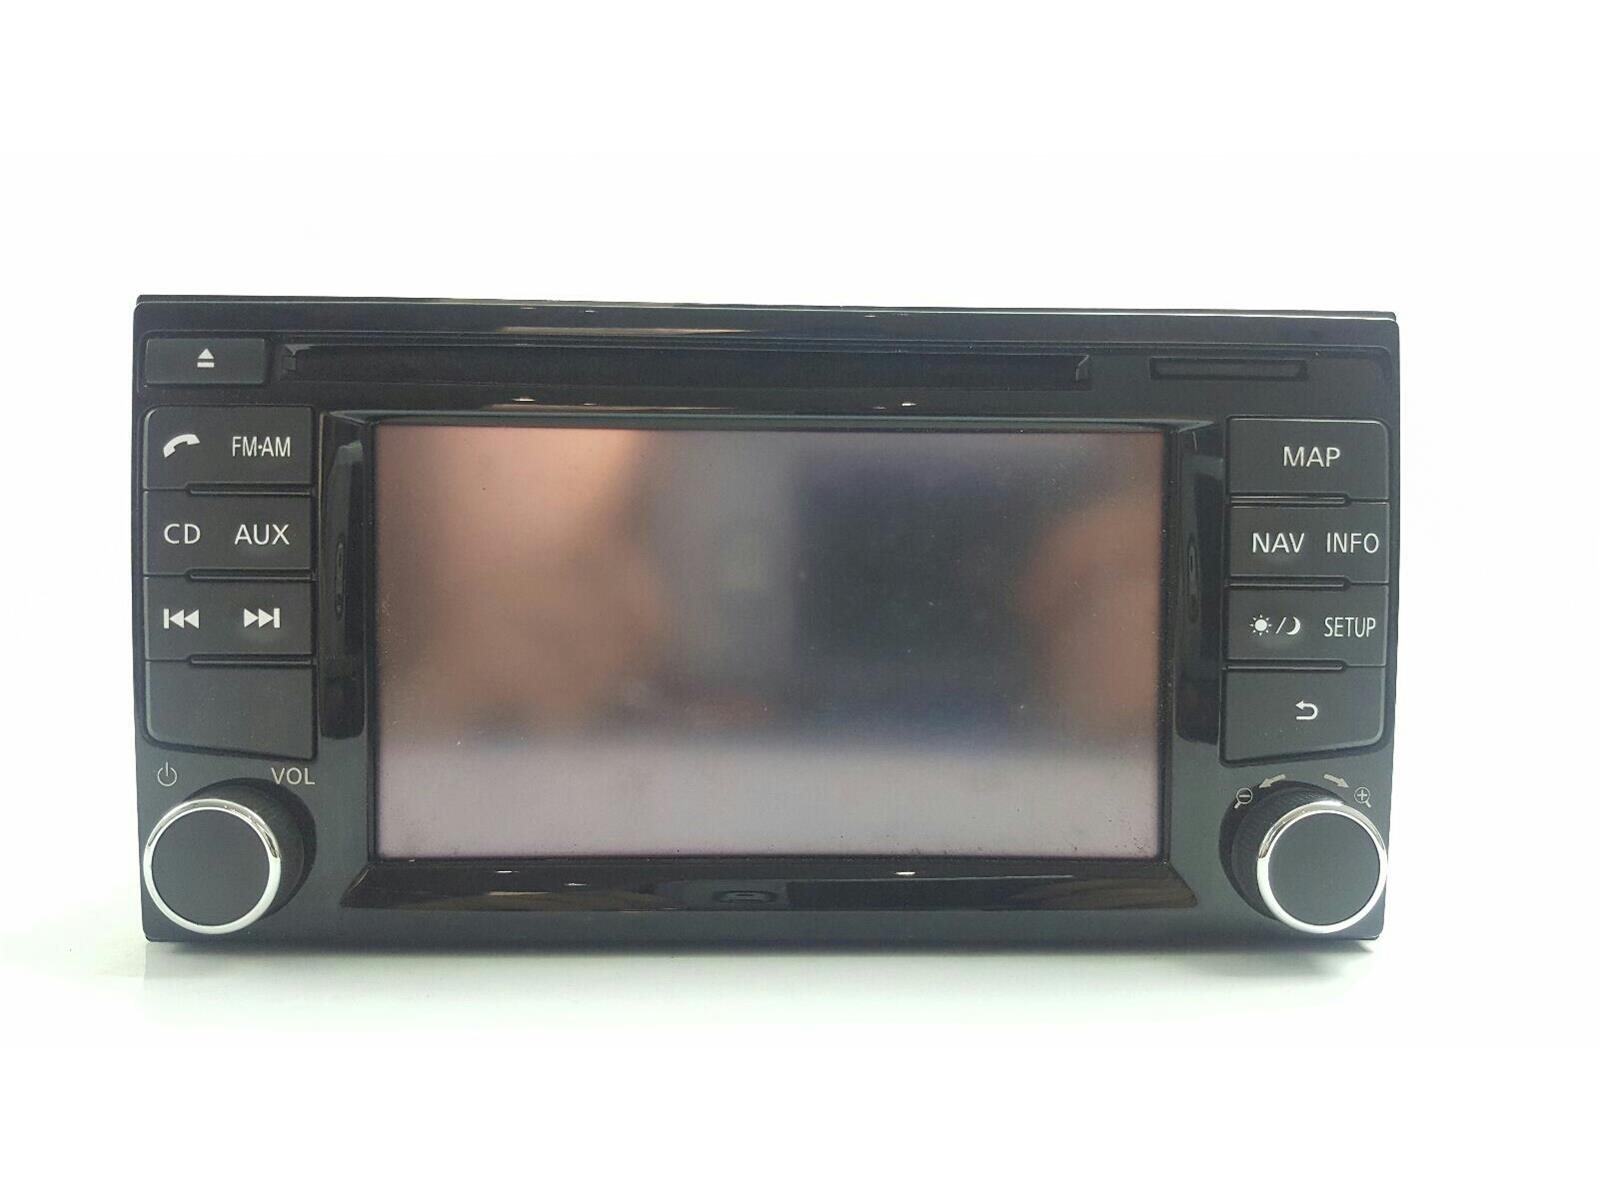 2014 MK2 Nissan Note LCN20A Satellite Navigation